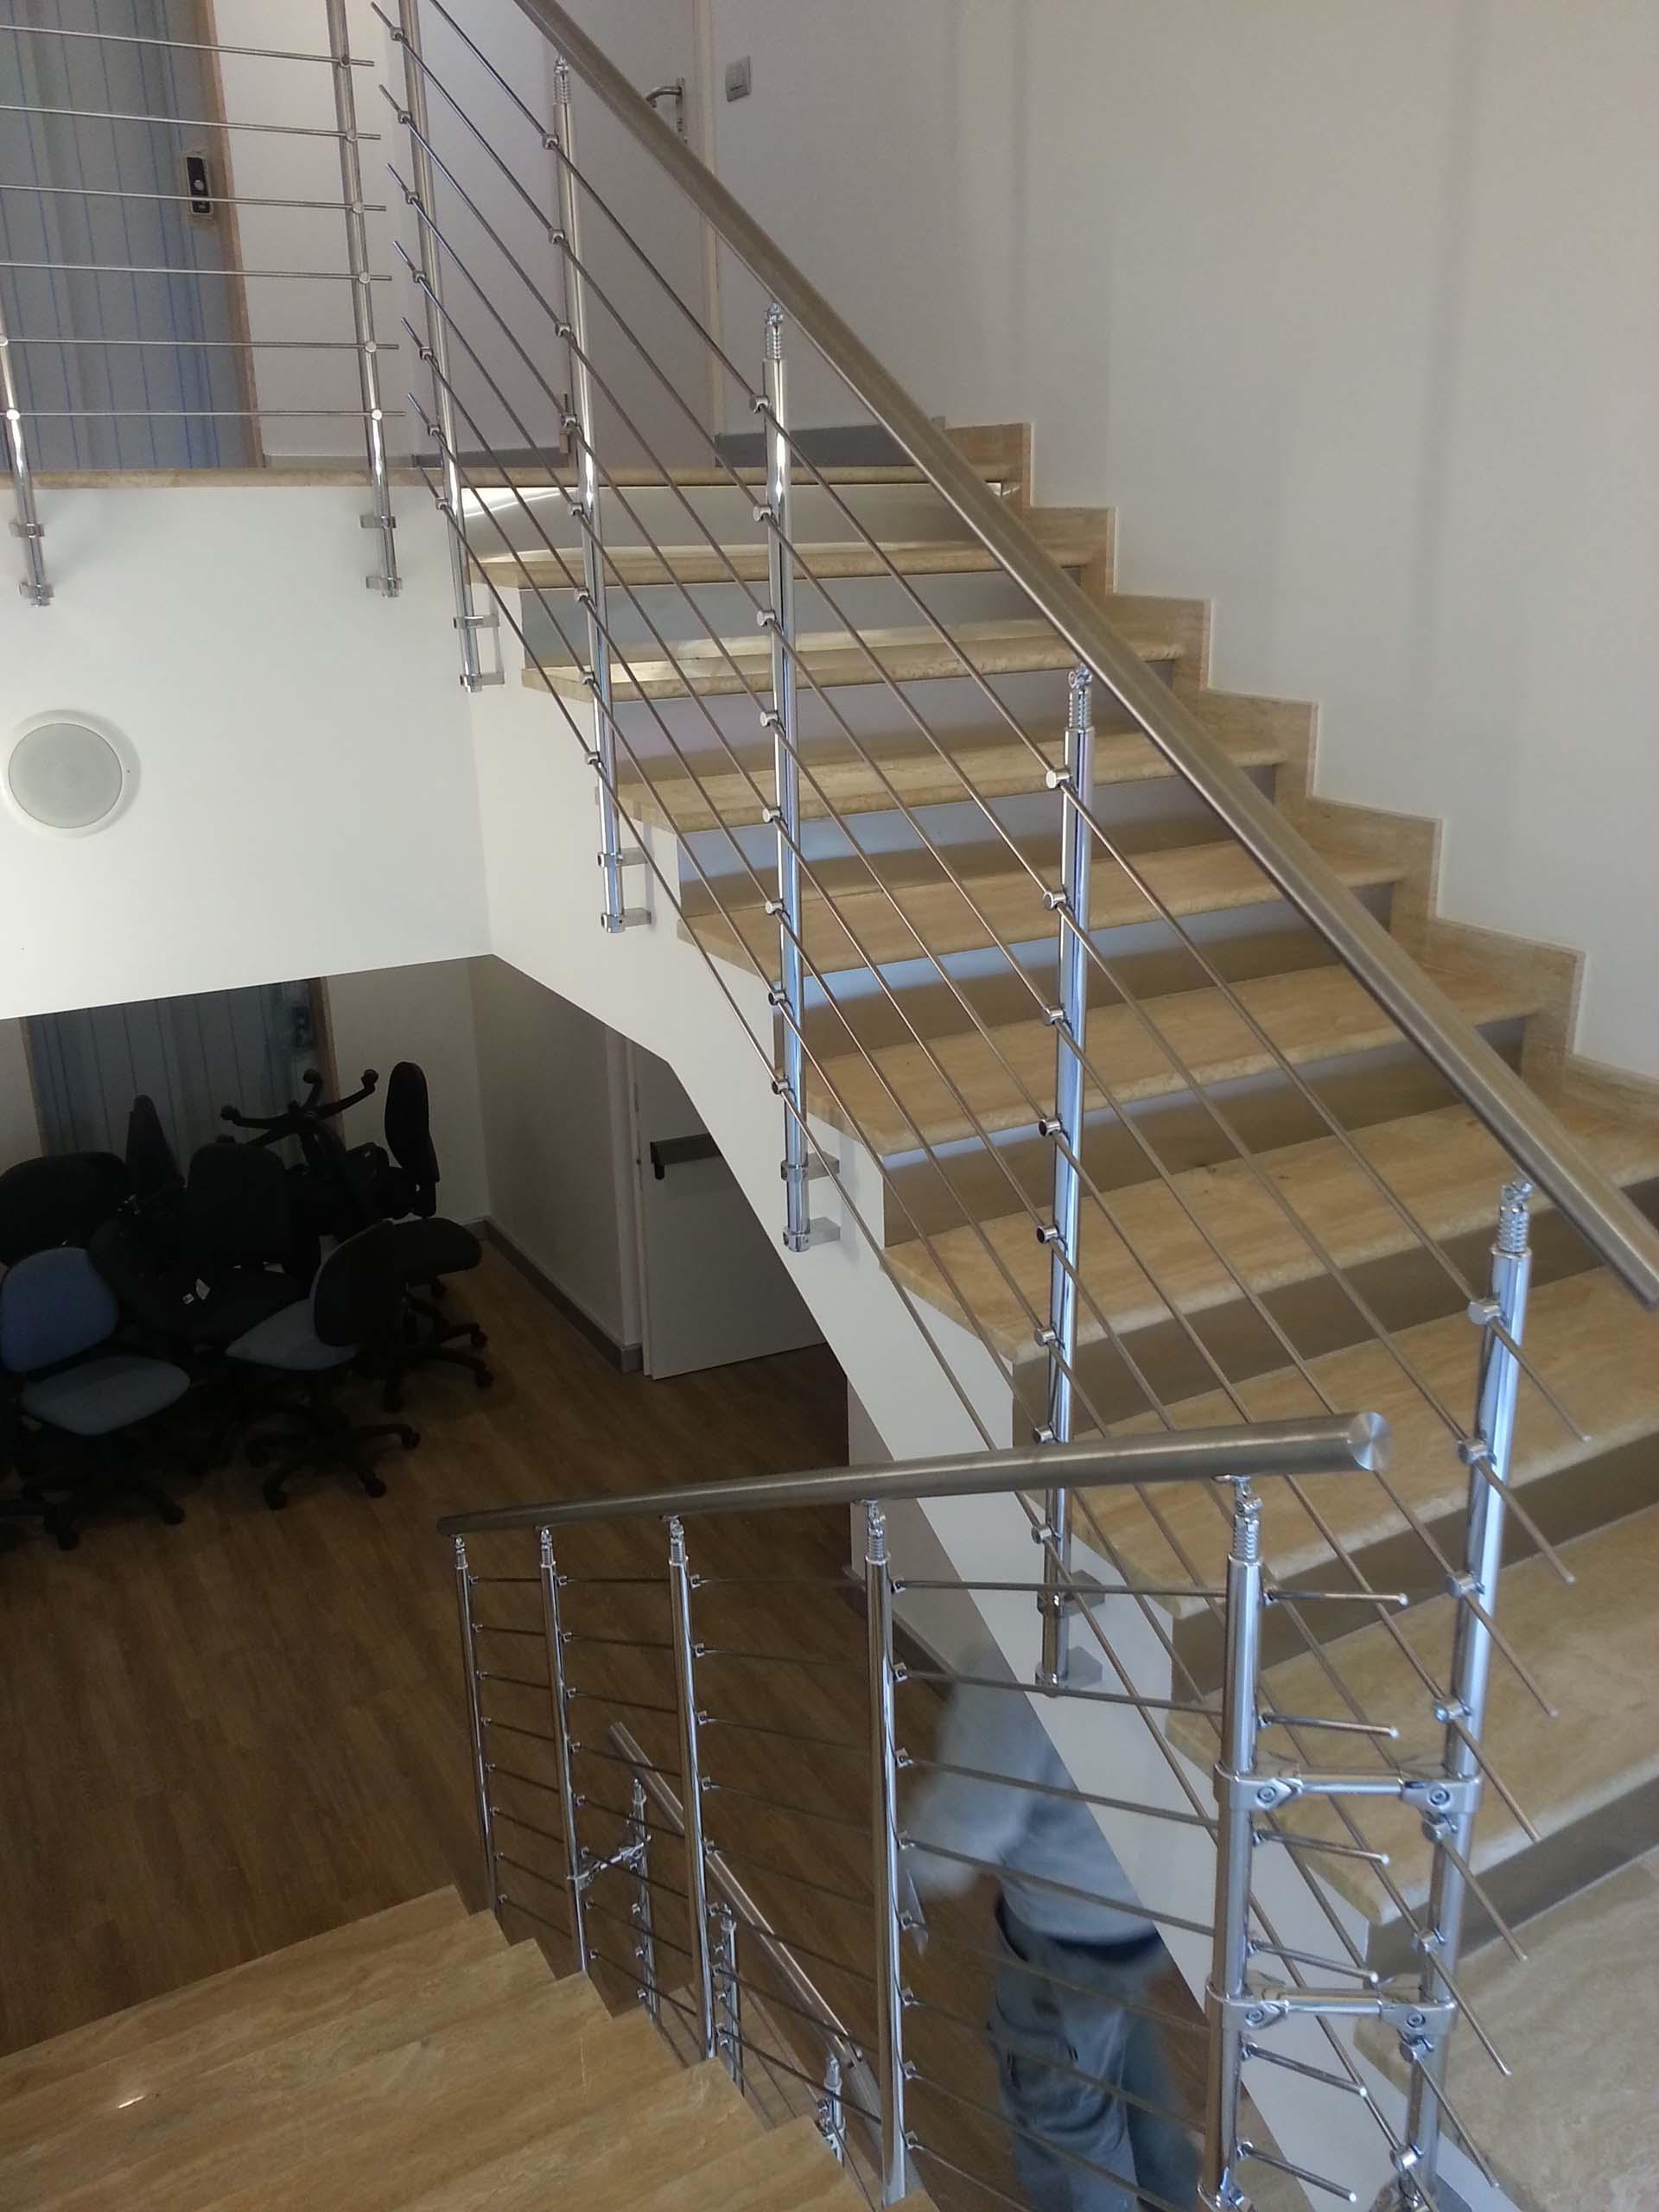 mobirolo escaleras de madera maciza escaleras de design escaleras para exteriores escaleras en metal escaleras escaleras reentrantes